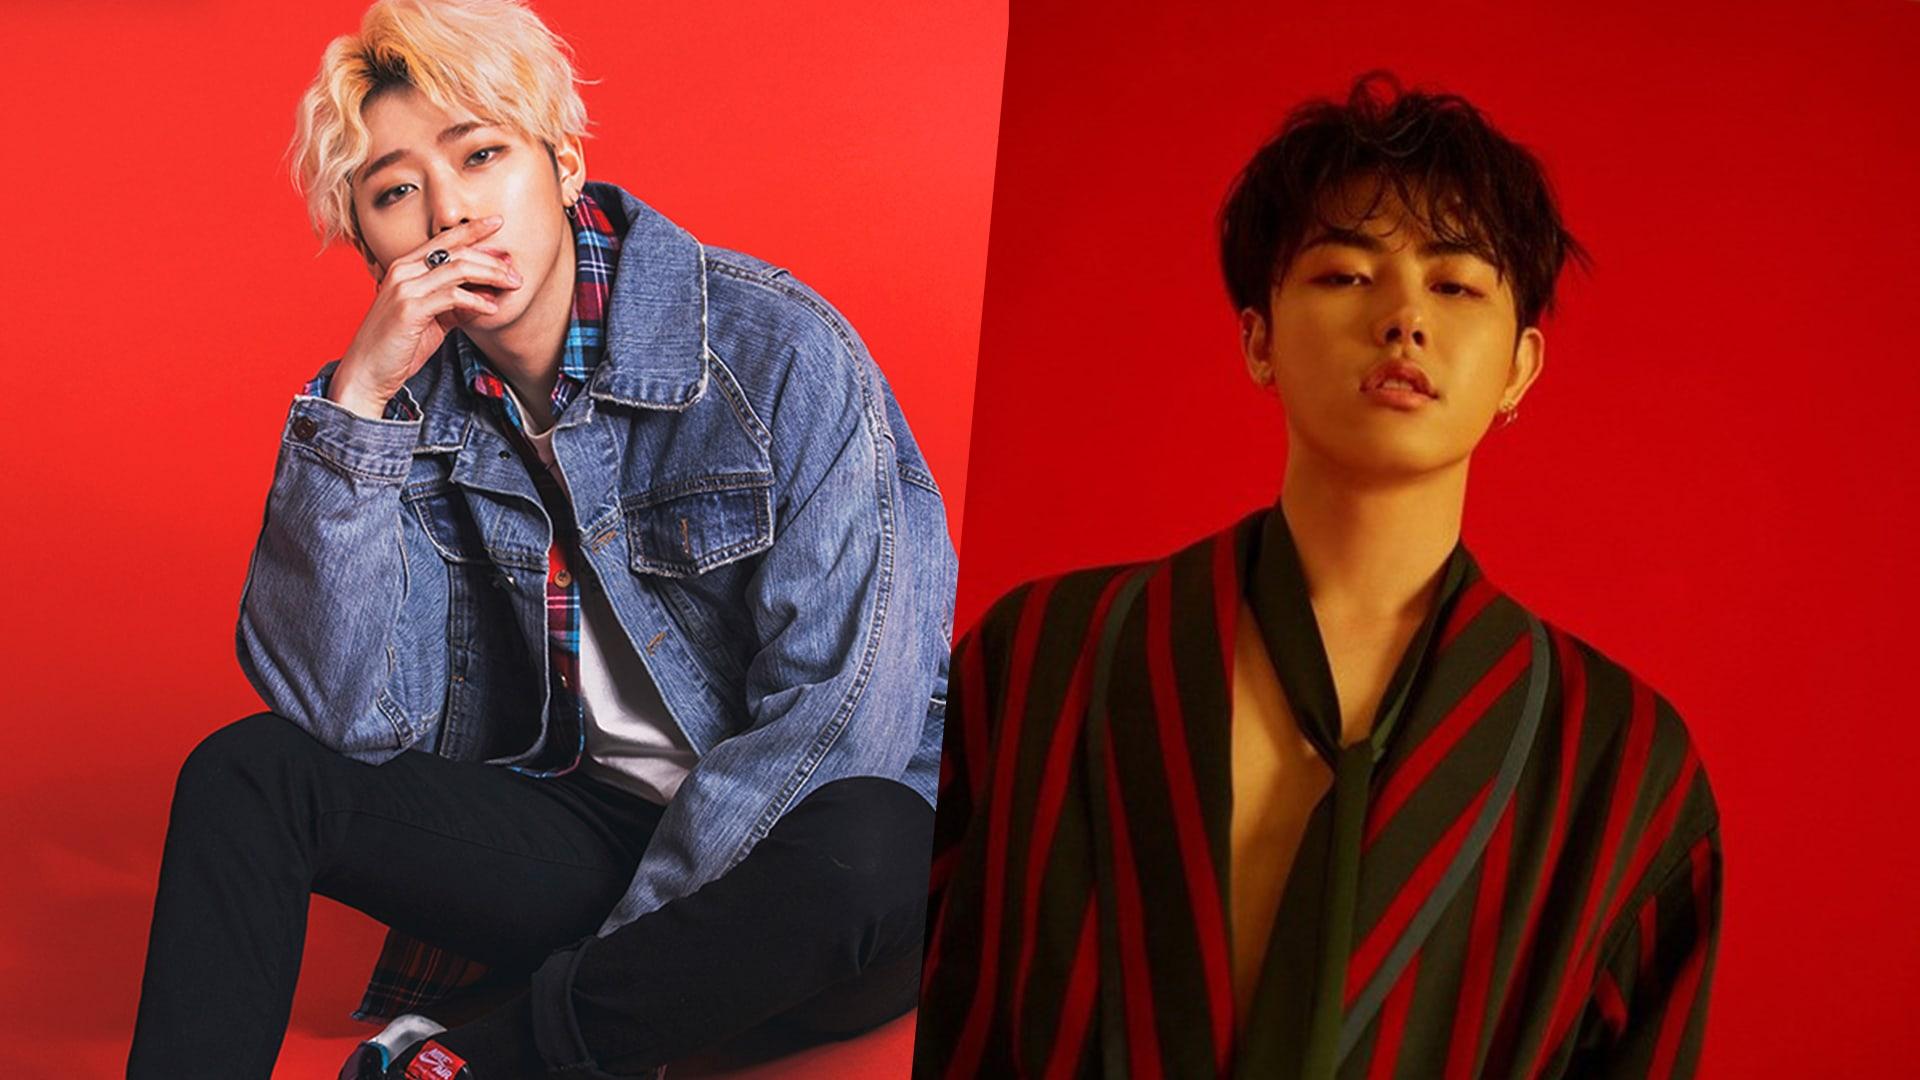 Block B's U-Kwon Explains Why He Feels A Sense Of Guilt When He Thinks Of Zico